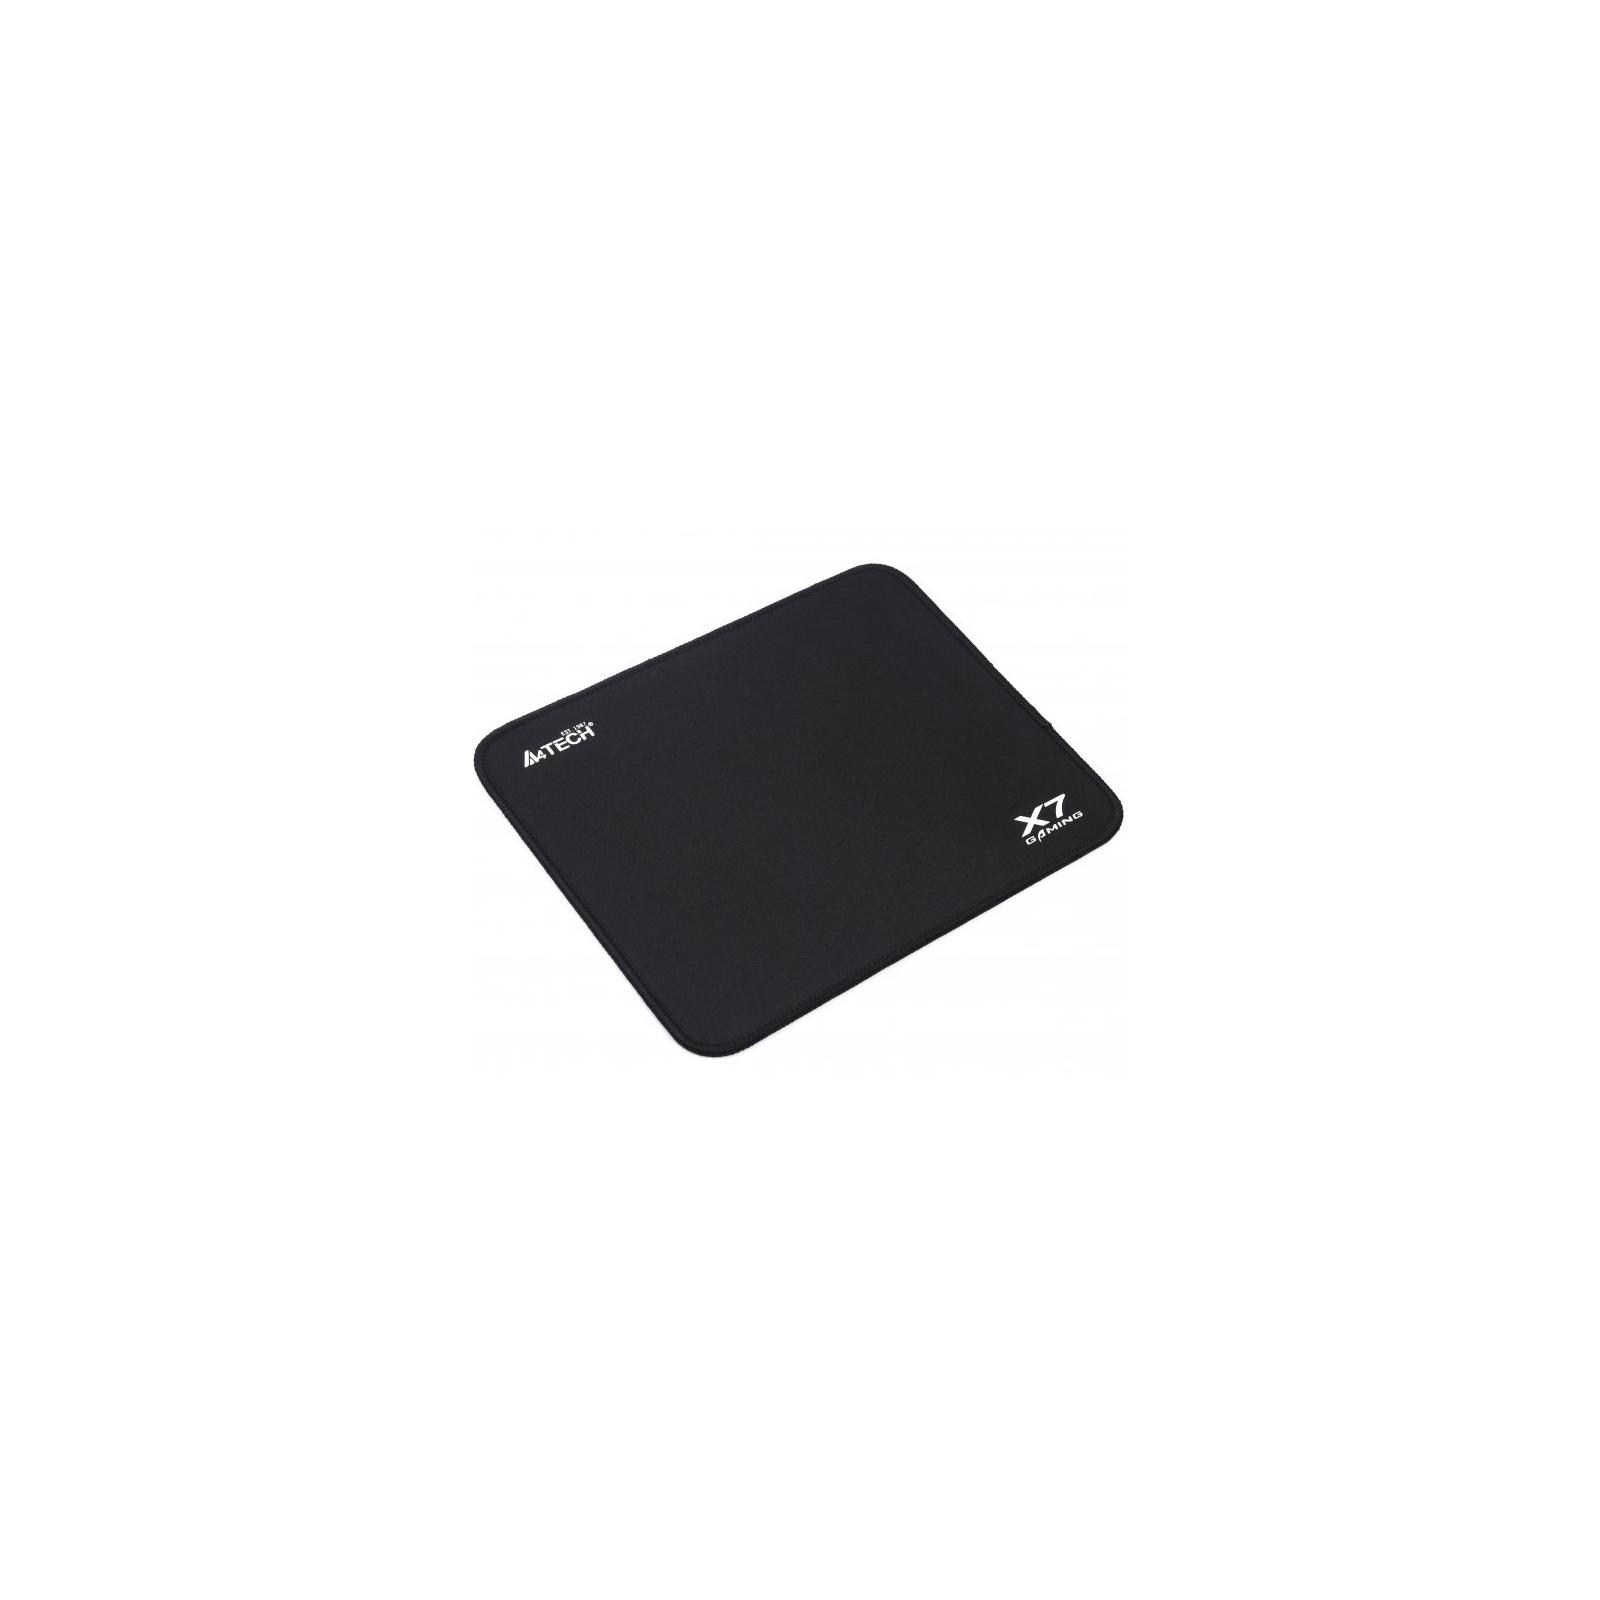 Коврик game pad A4tech (X7-200MP)